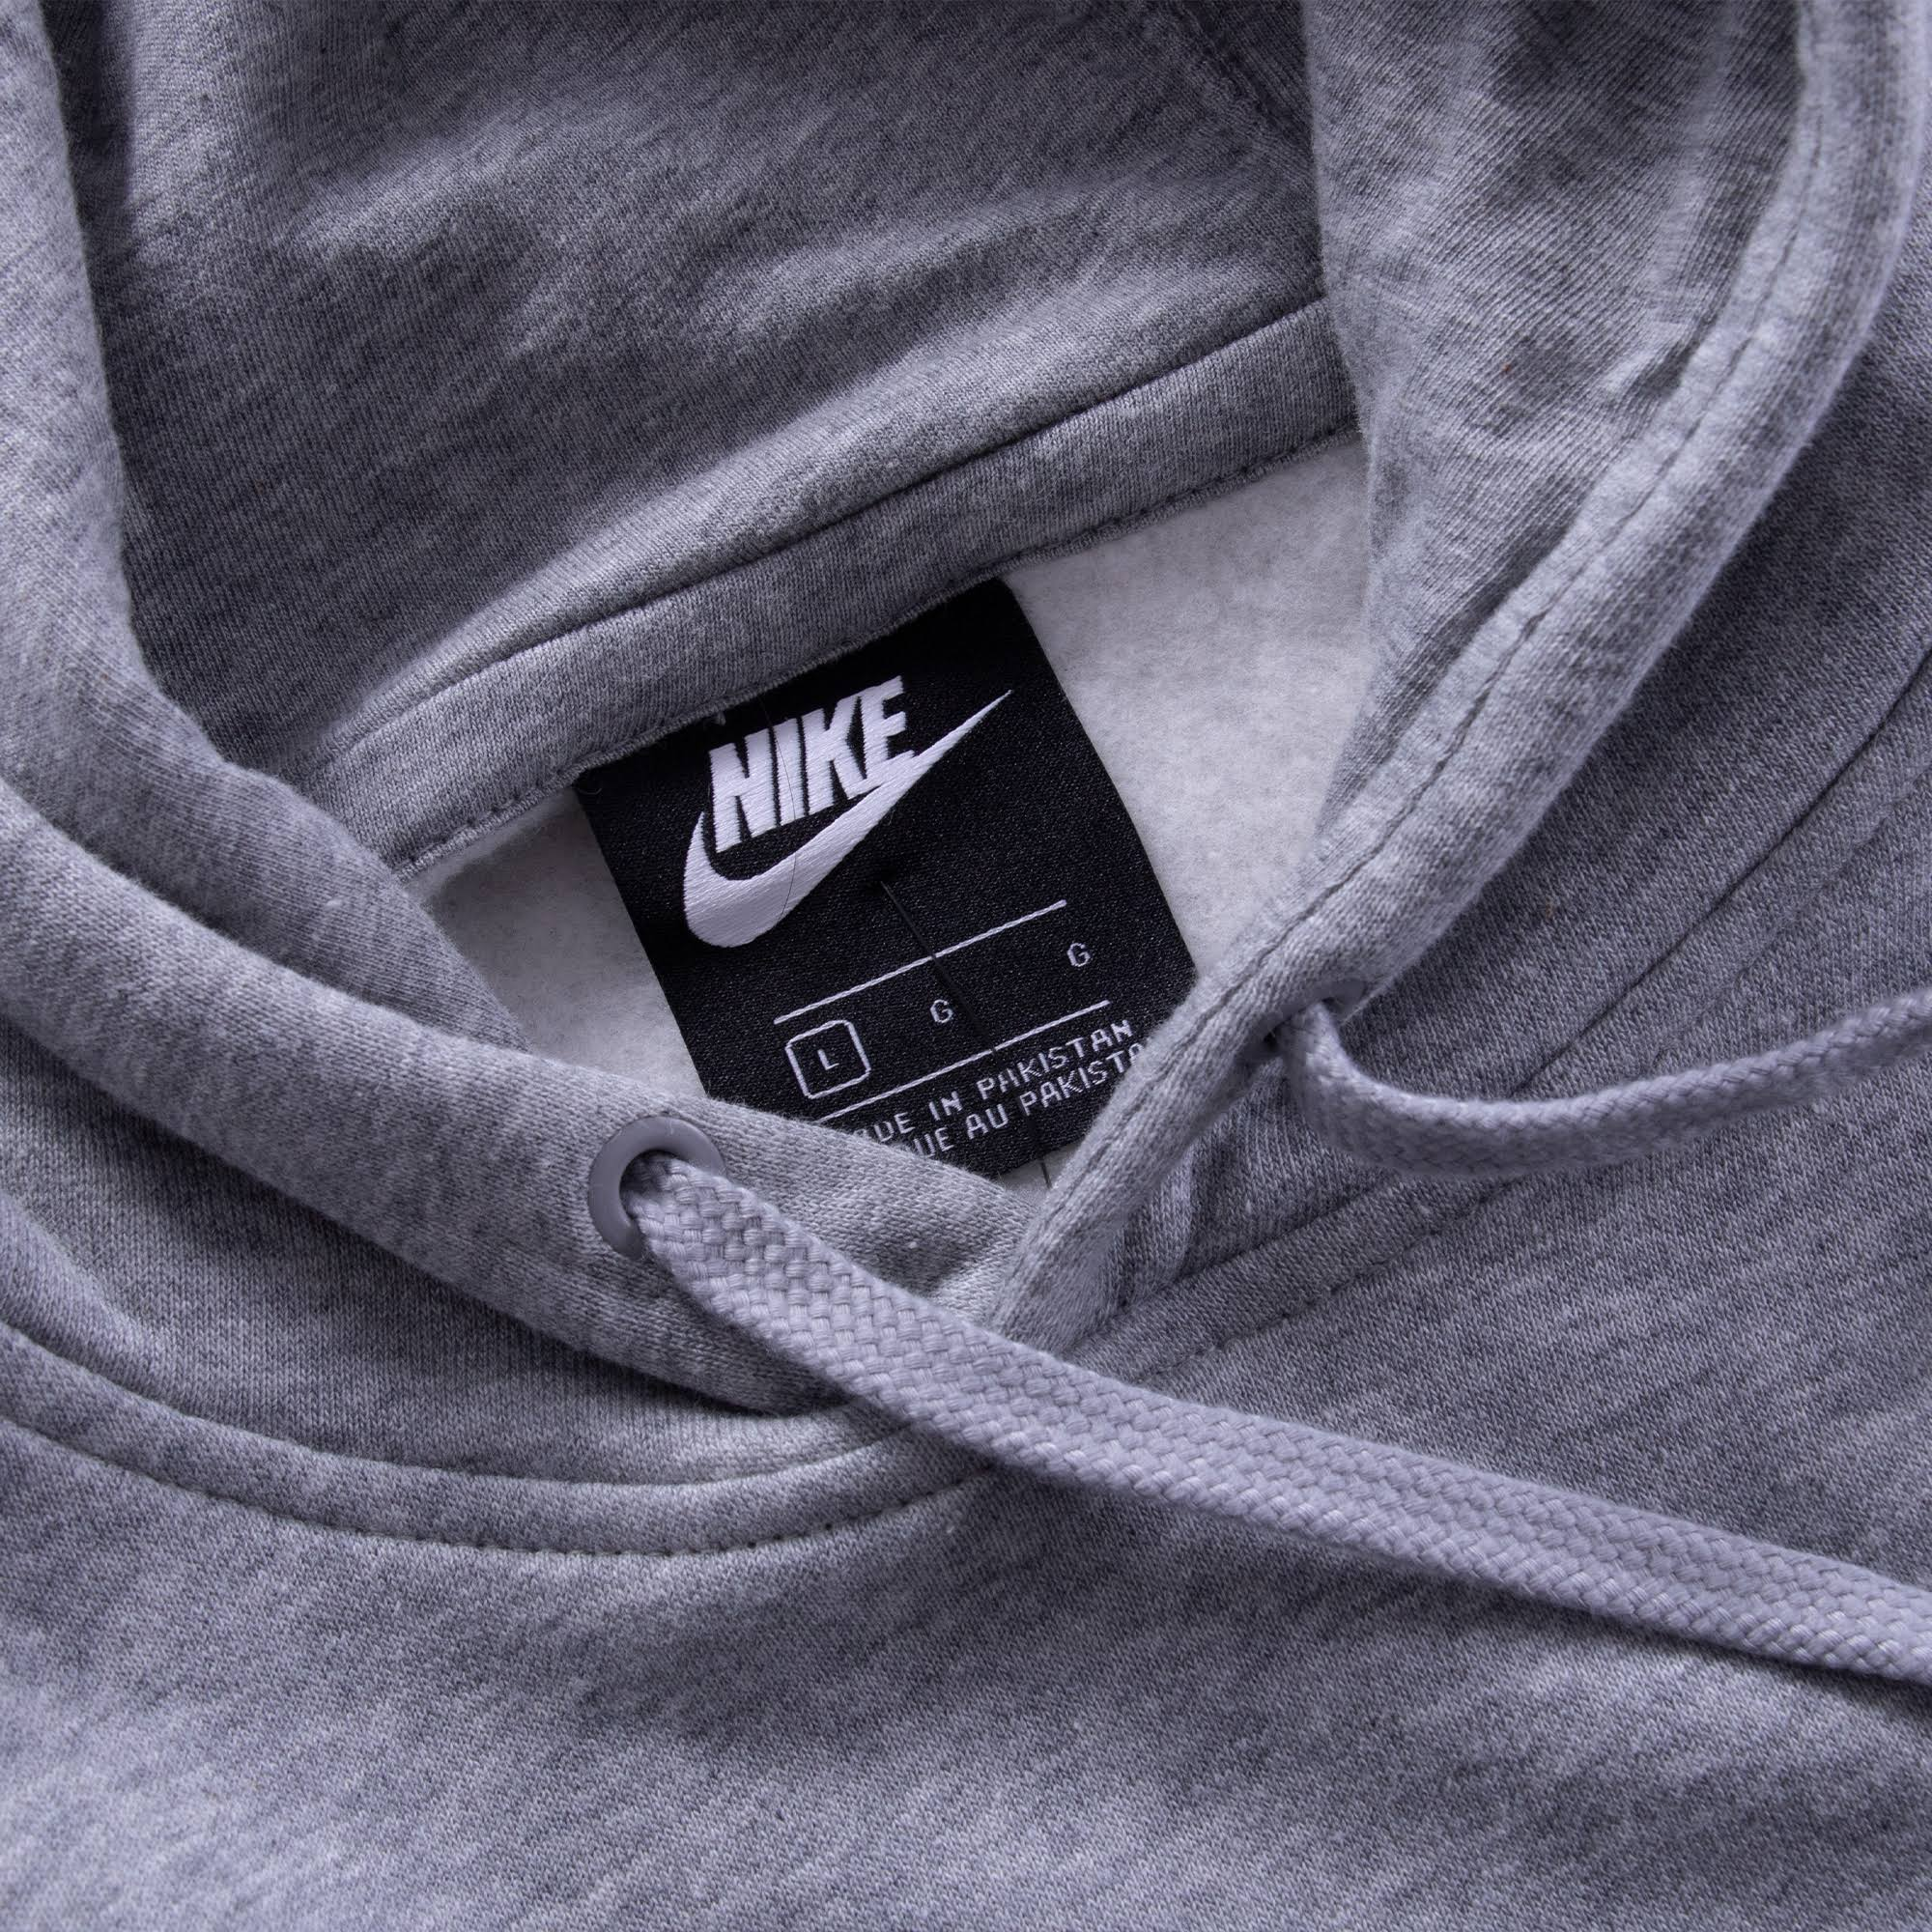 Foncé Gris Nike Blanc Club Sweat Chiné À Capuche wxXqUIPv